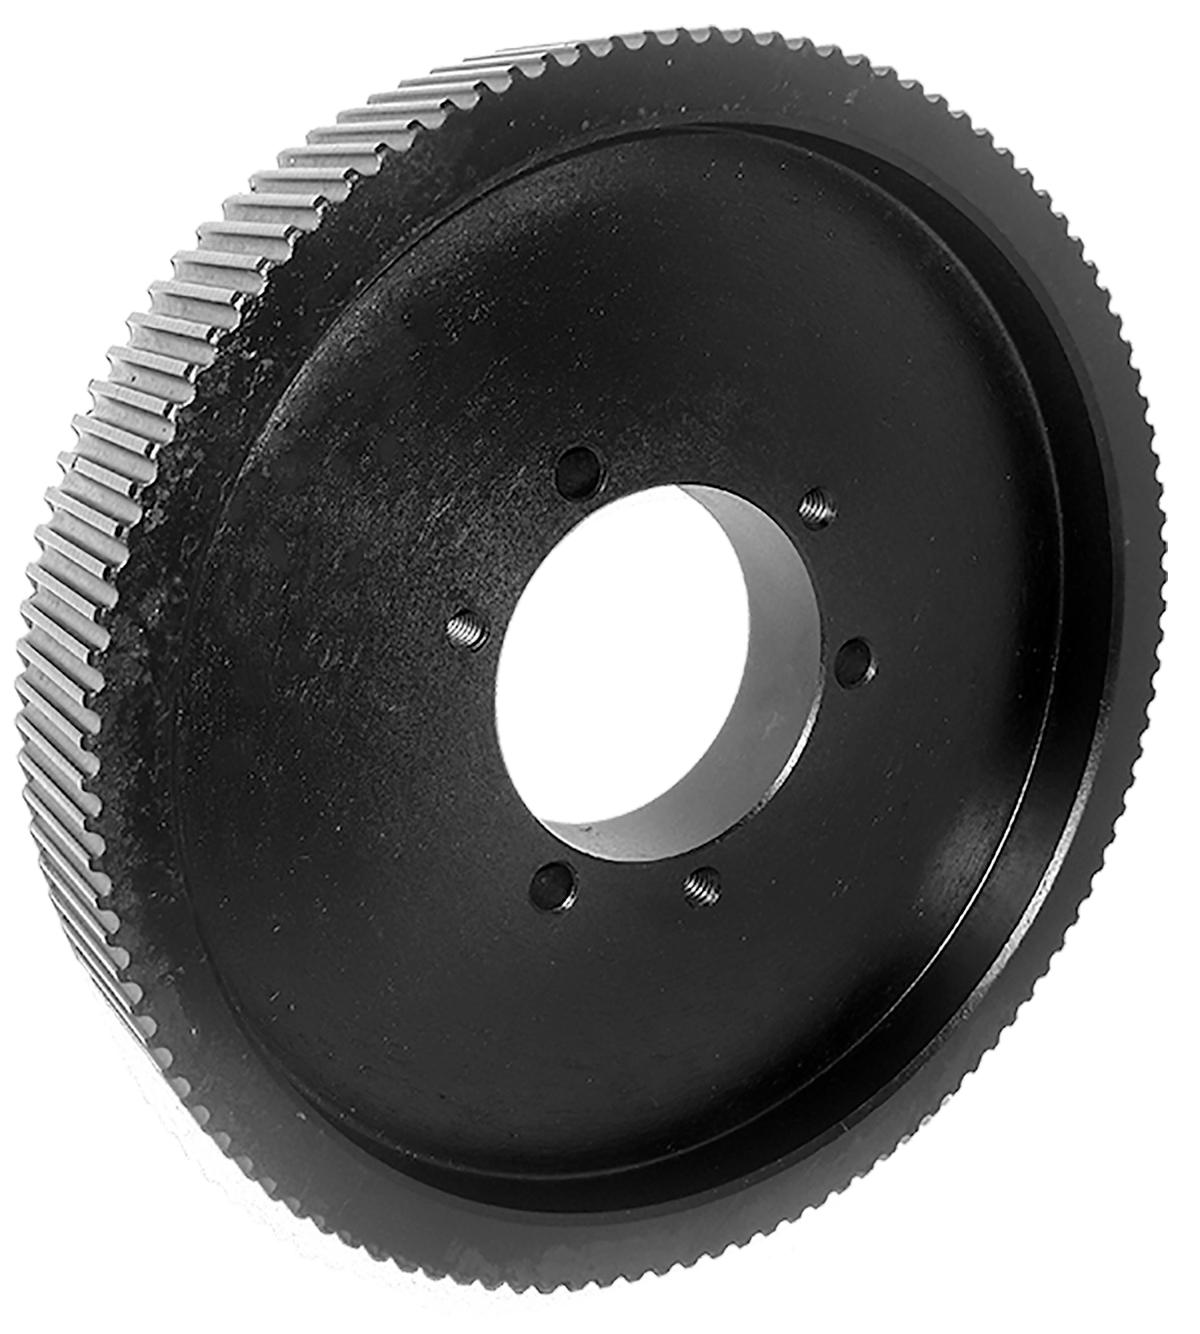 QD112-5M-25 - Cast Iron Powerhouse®HTD® Pulleys